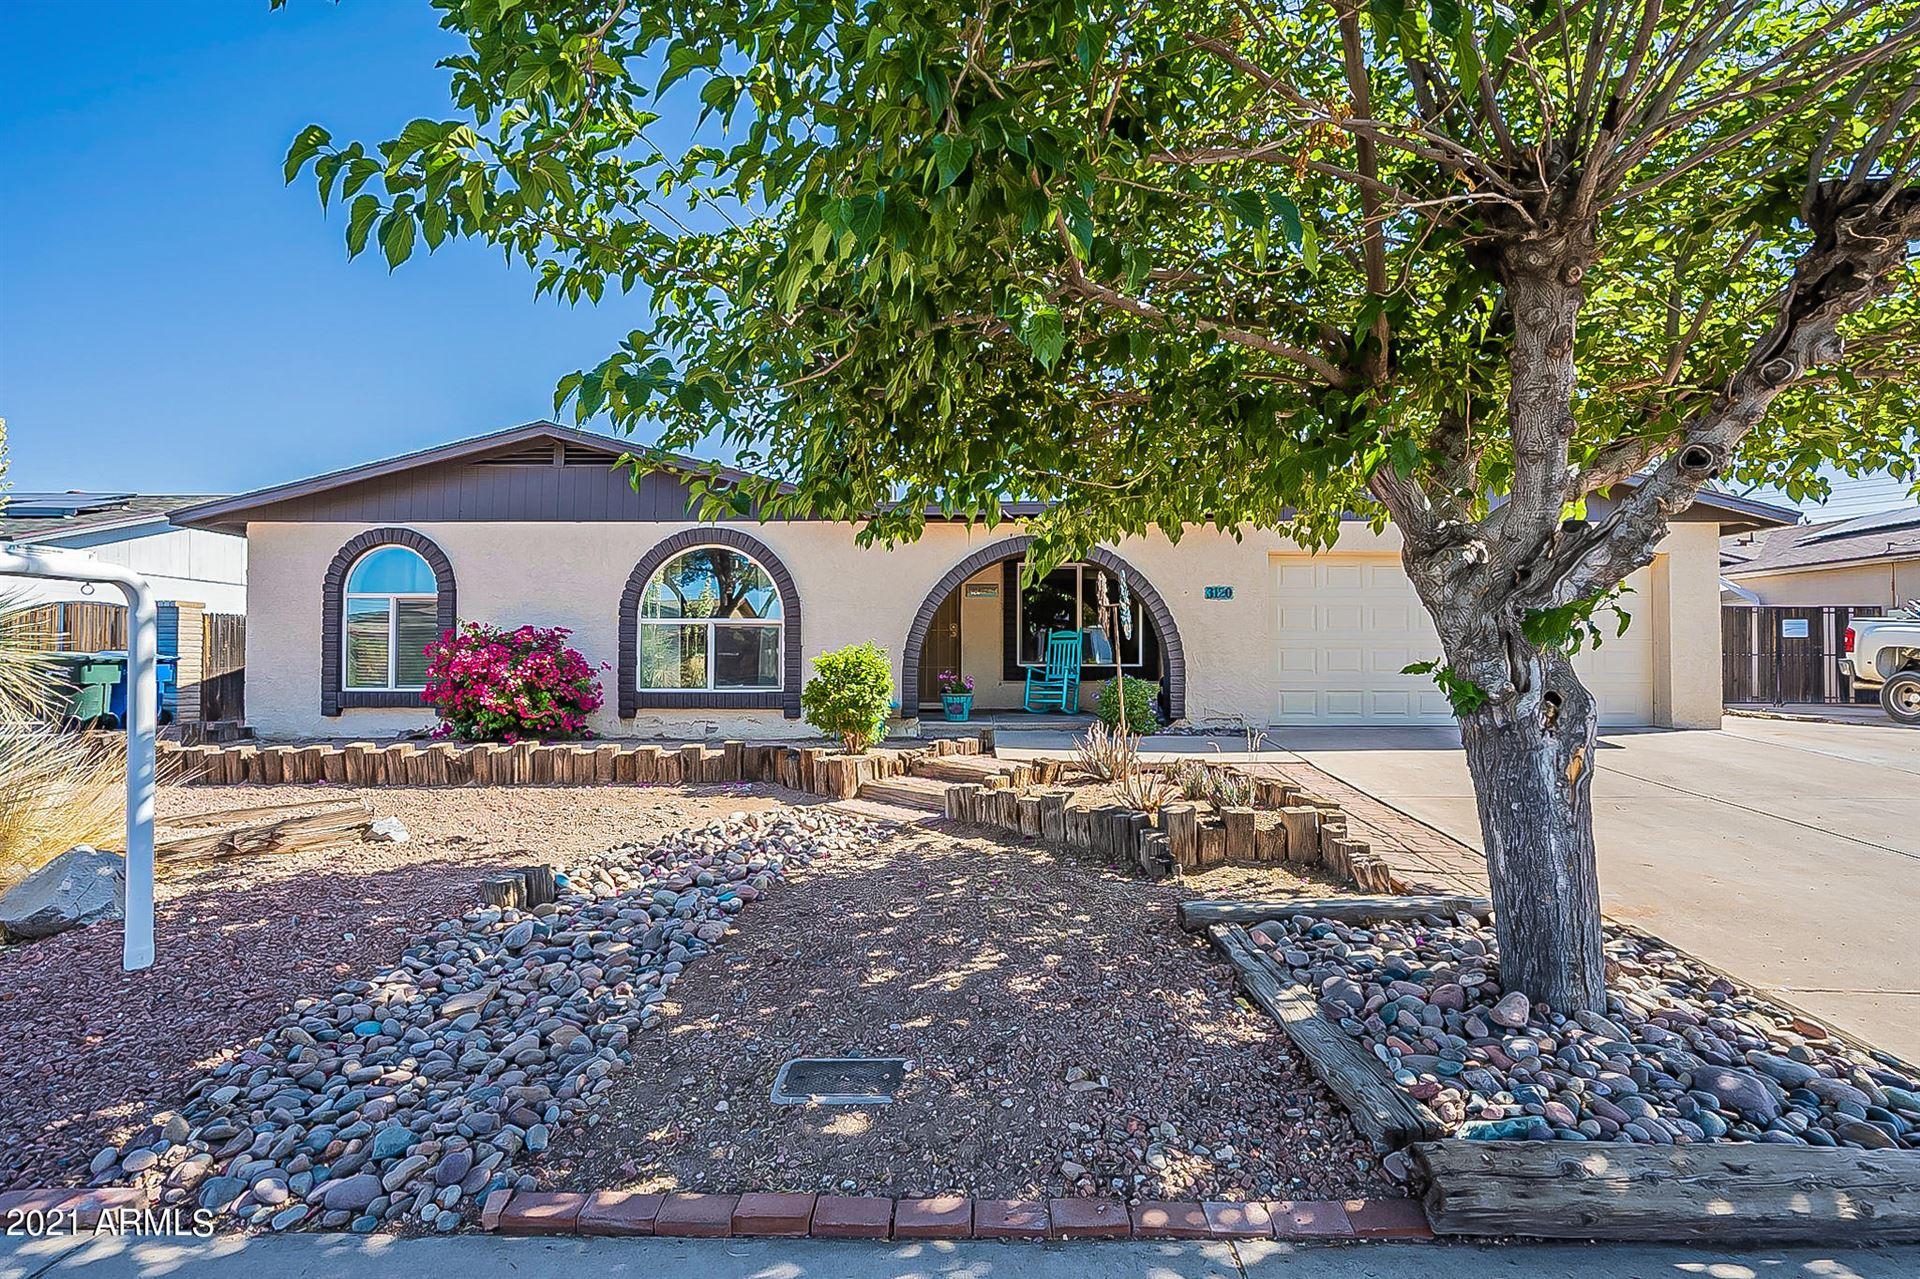 Photo of 3120 W JULIE Drive, Phoenix, AZ 85027 (MLS # 6230545)